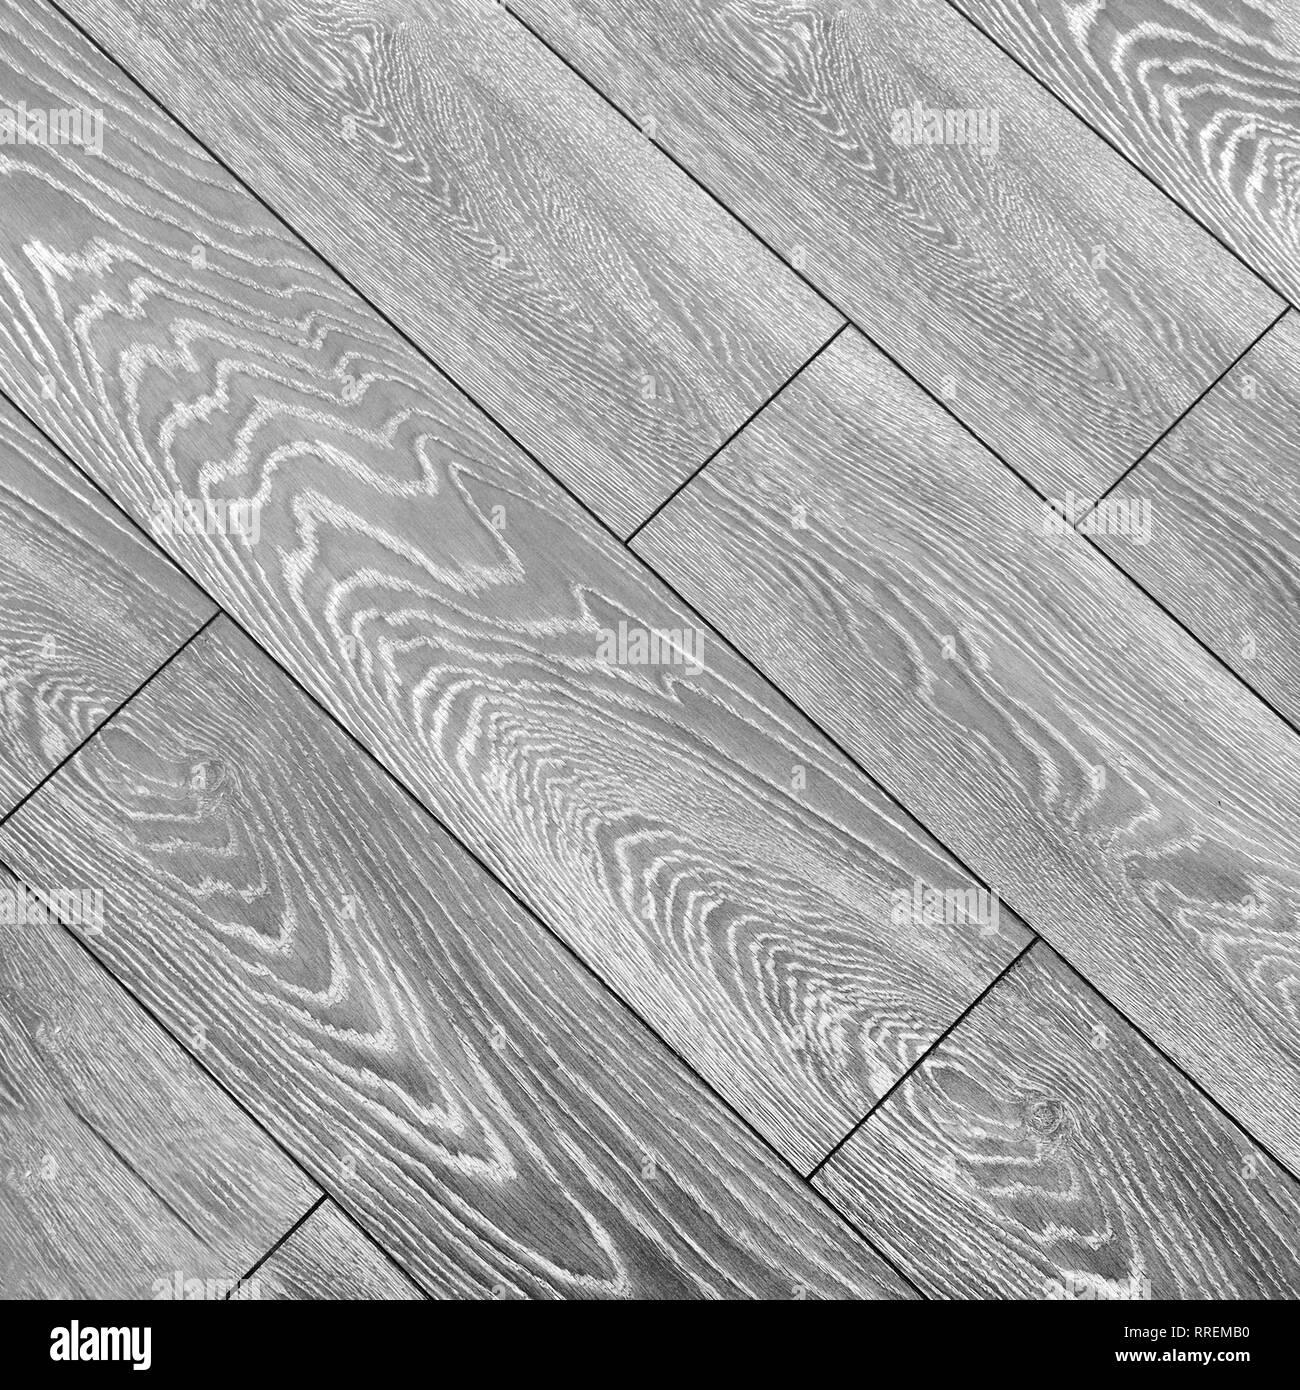 Stylish gray laminate flooring with strong natural wood pattern - Stock Image